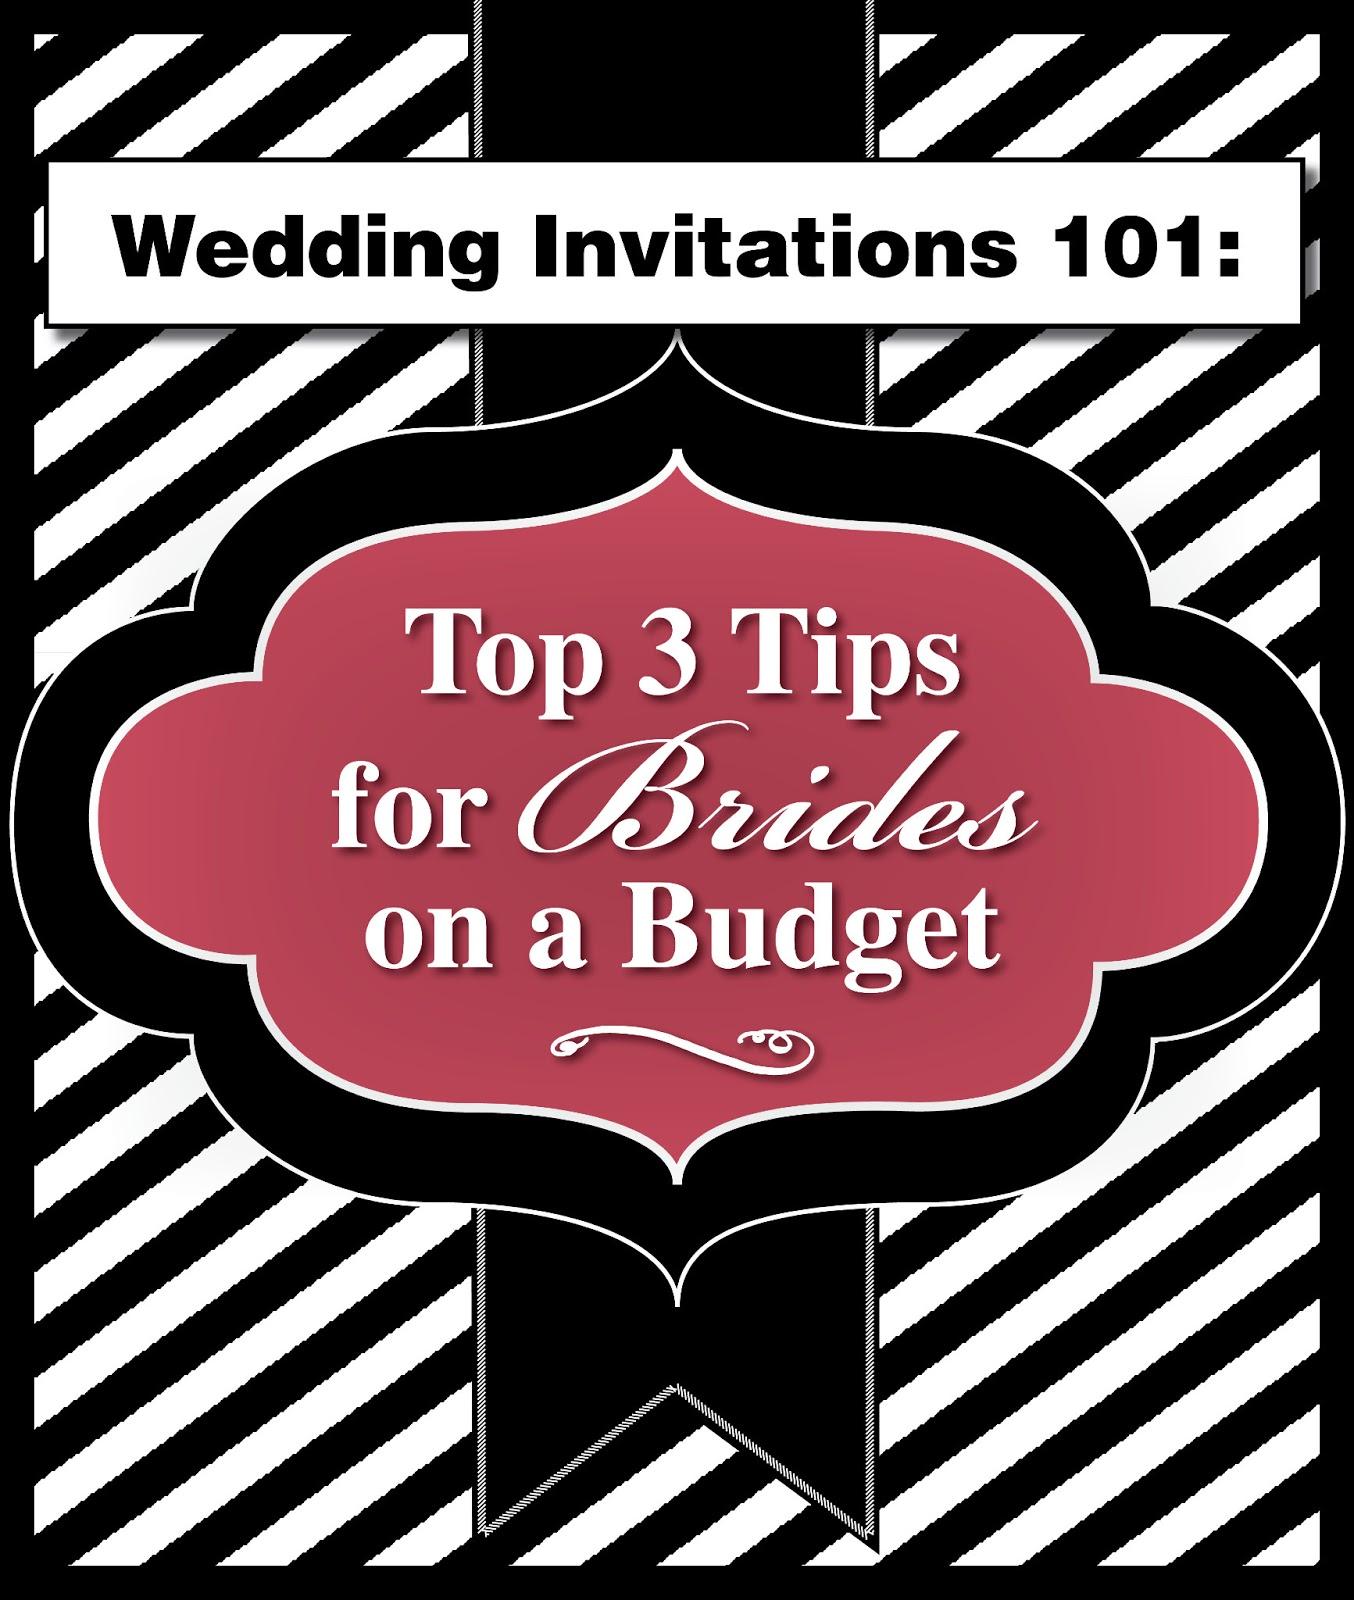 Wedding Invitation Blog: 2013